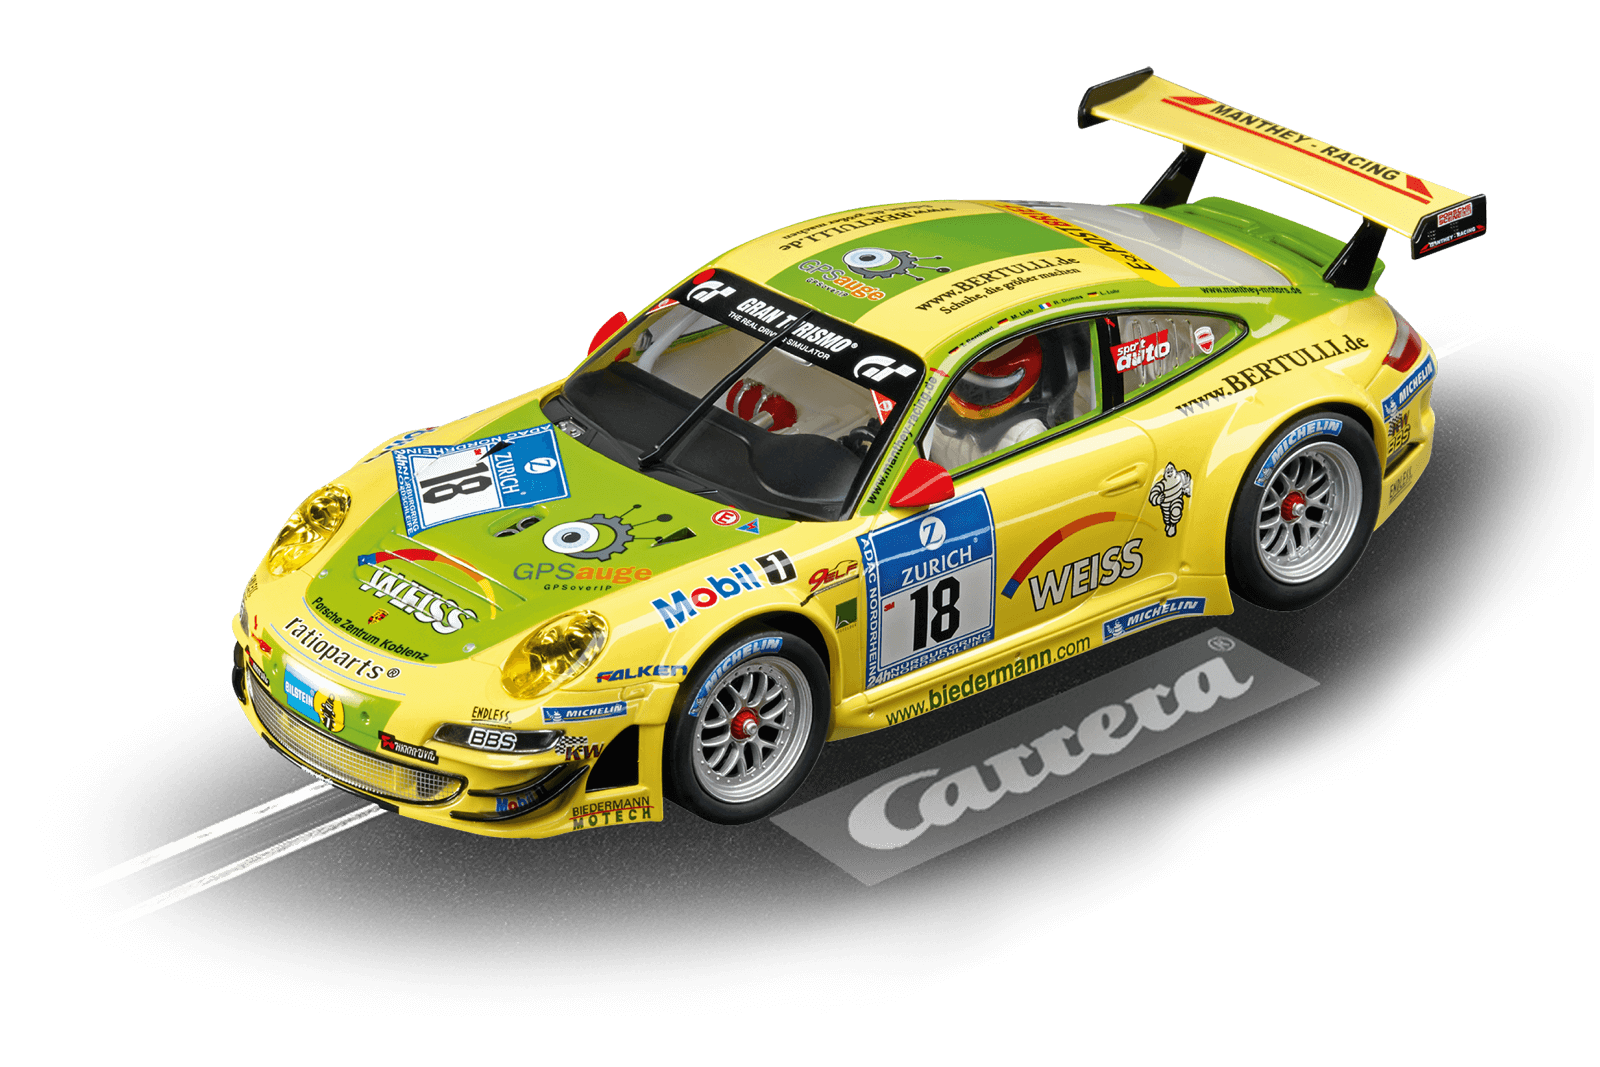 Top Tuning Carrera 124 Digitale - Porsche GT3 Rsr   Manthey No18   come 23794